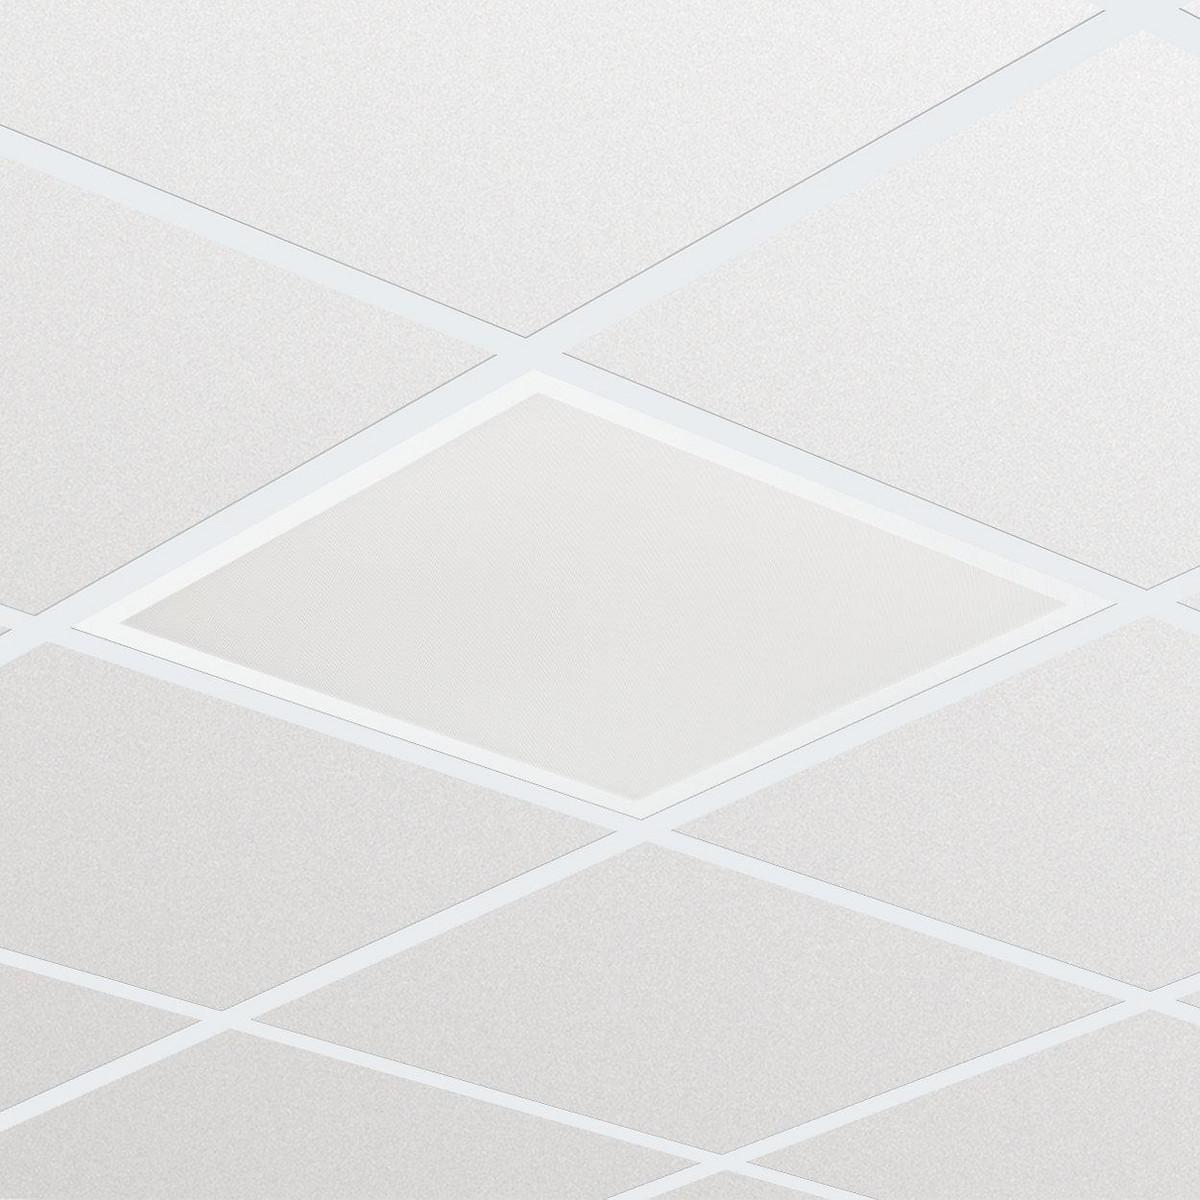 Philips SlimBlend Indbyg Kvadratisk RC400B LED 3600lm/840 DALI 60x60